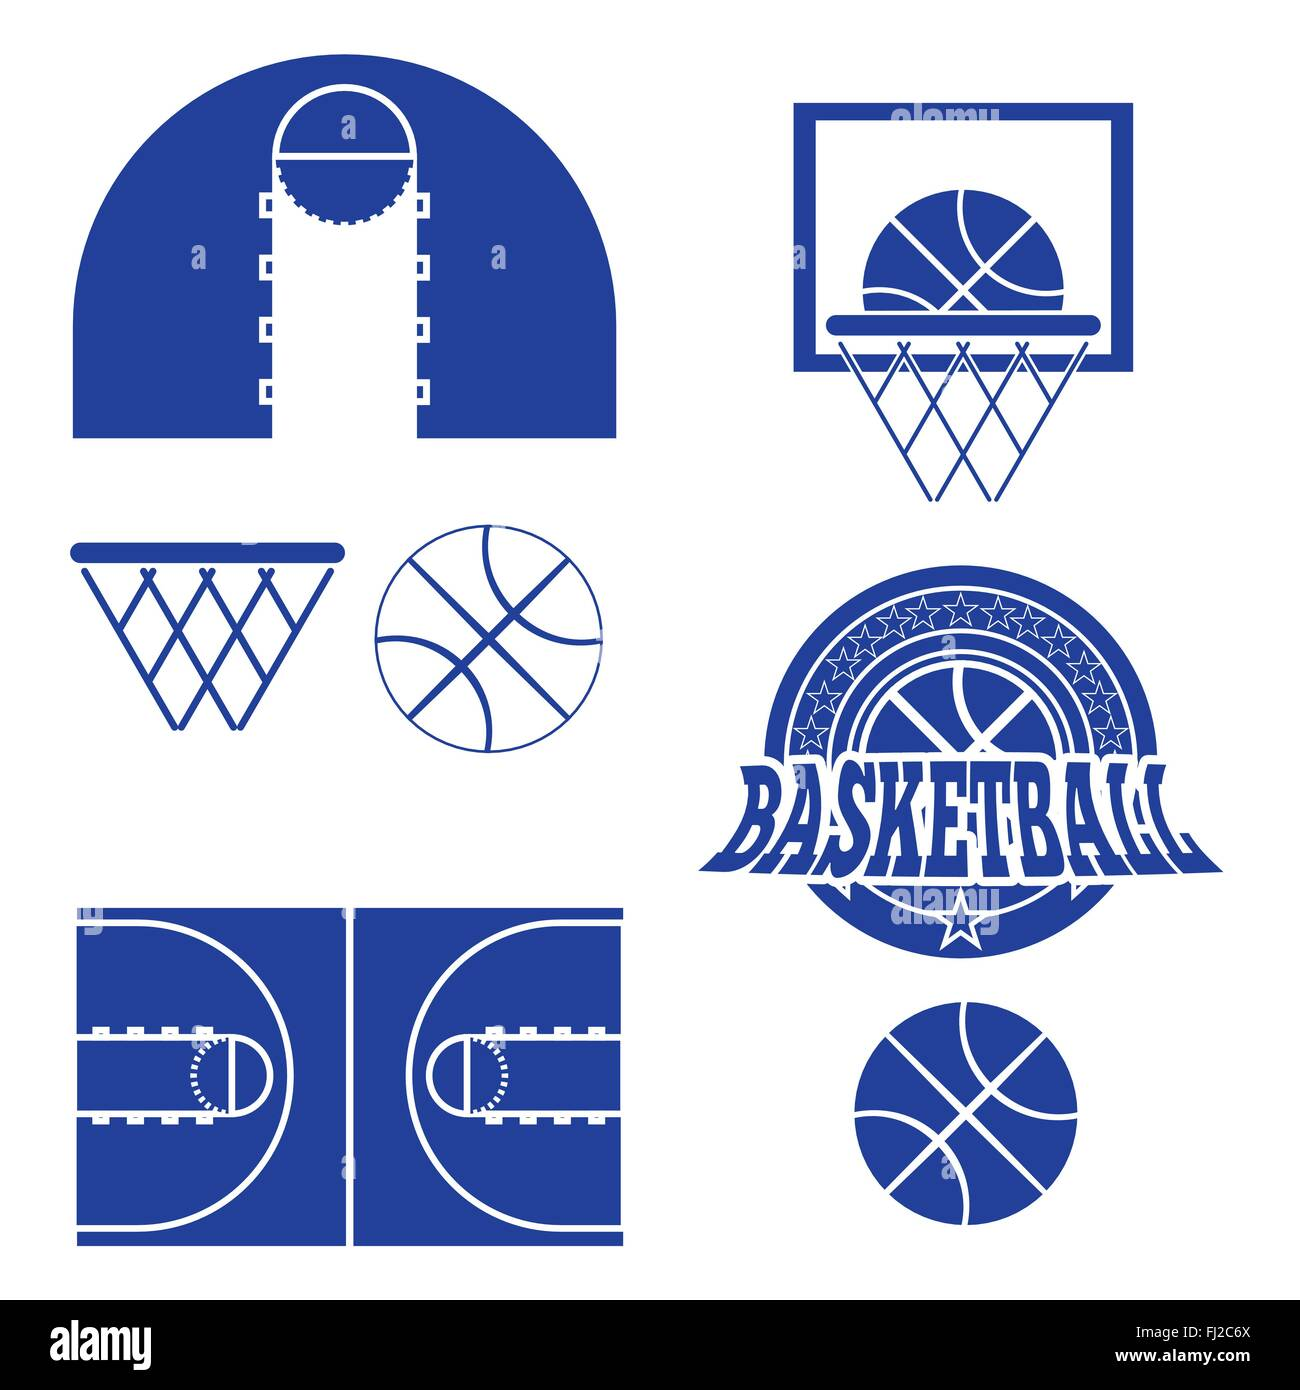 Basketball objects basketball ball in stars wreath type logo stock basketball ball in stars wreath type logo basketball play court design sports symbols blue and white spor buycottarizona Choice Image